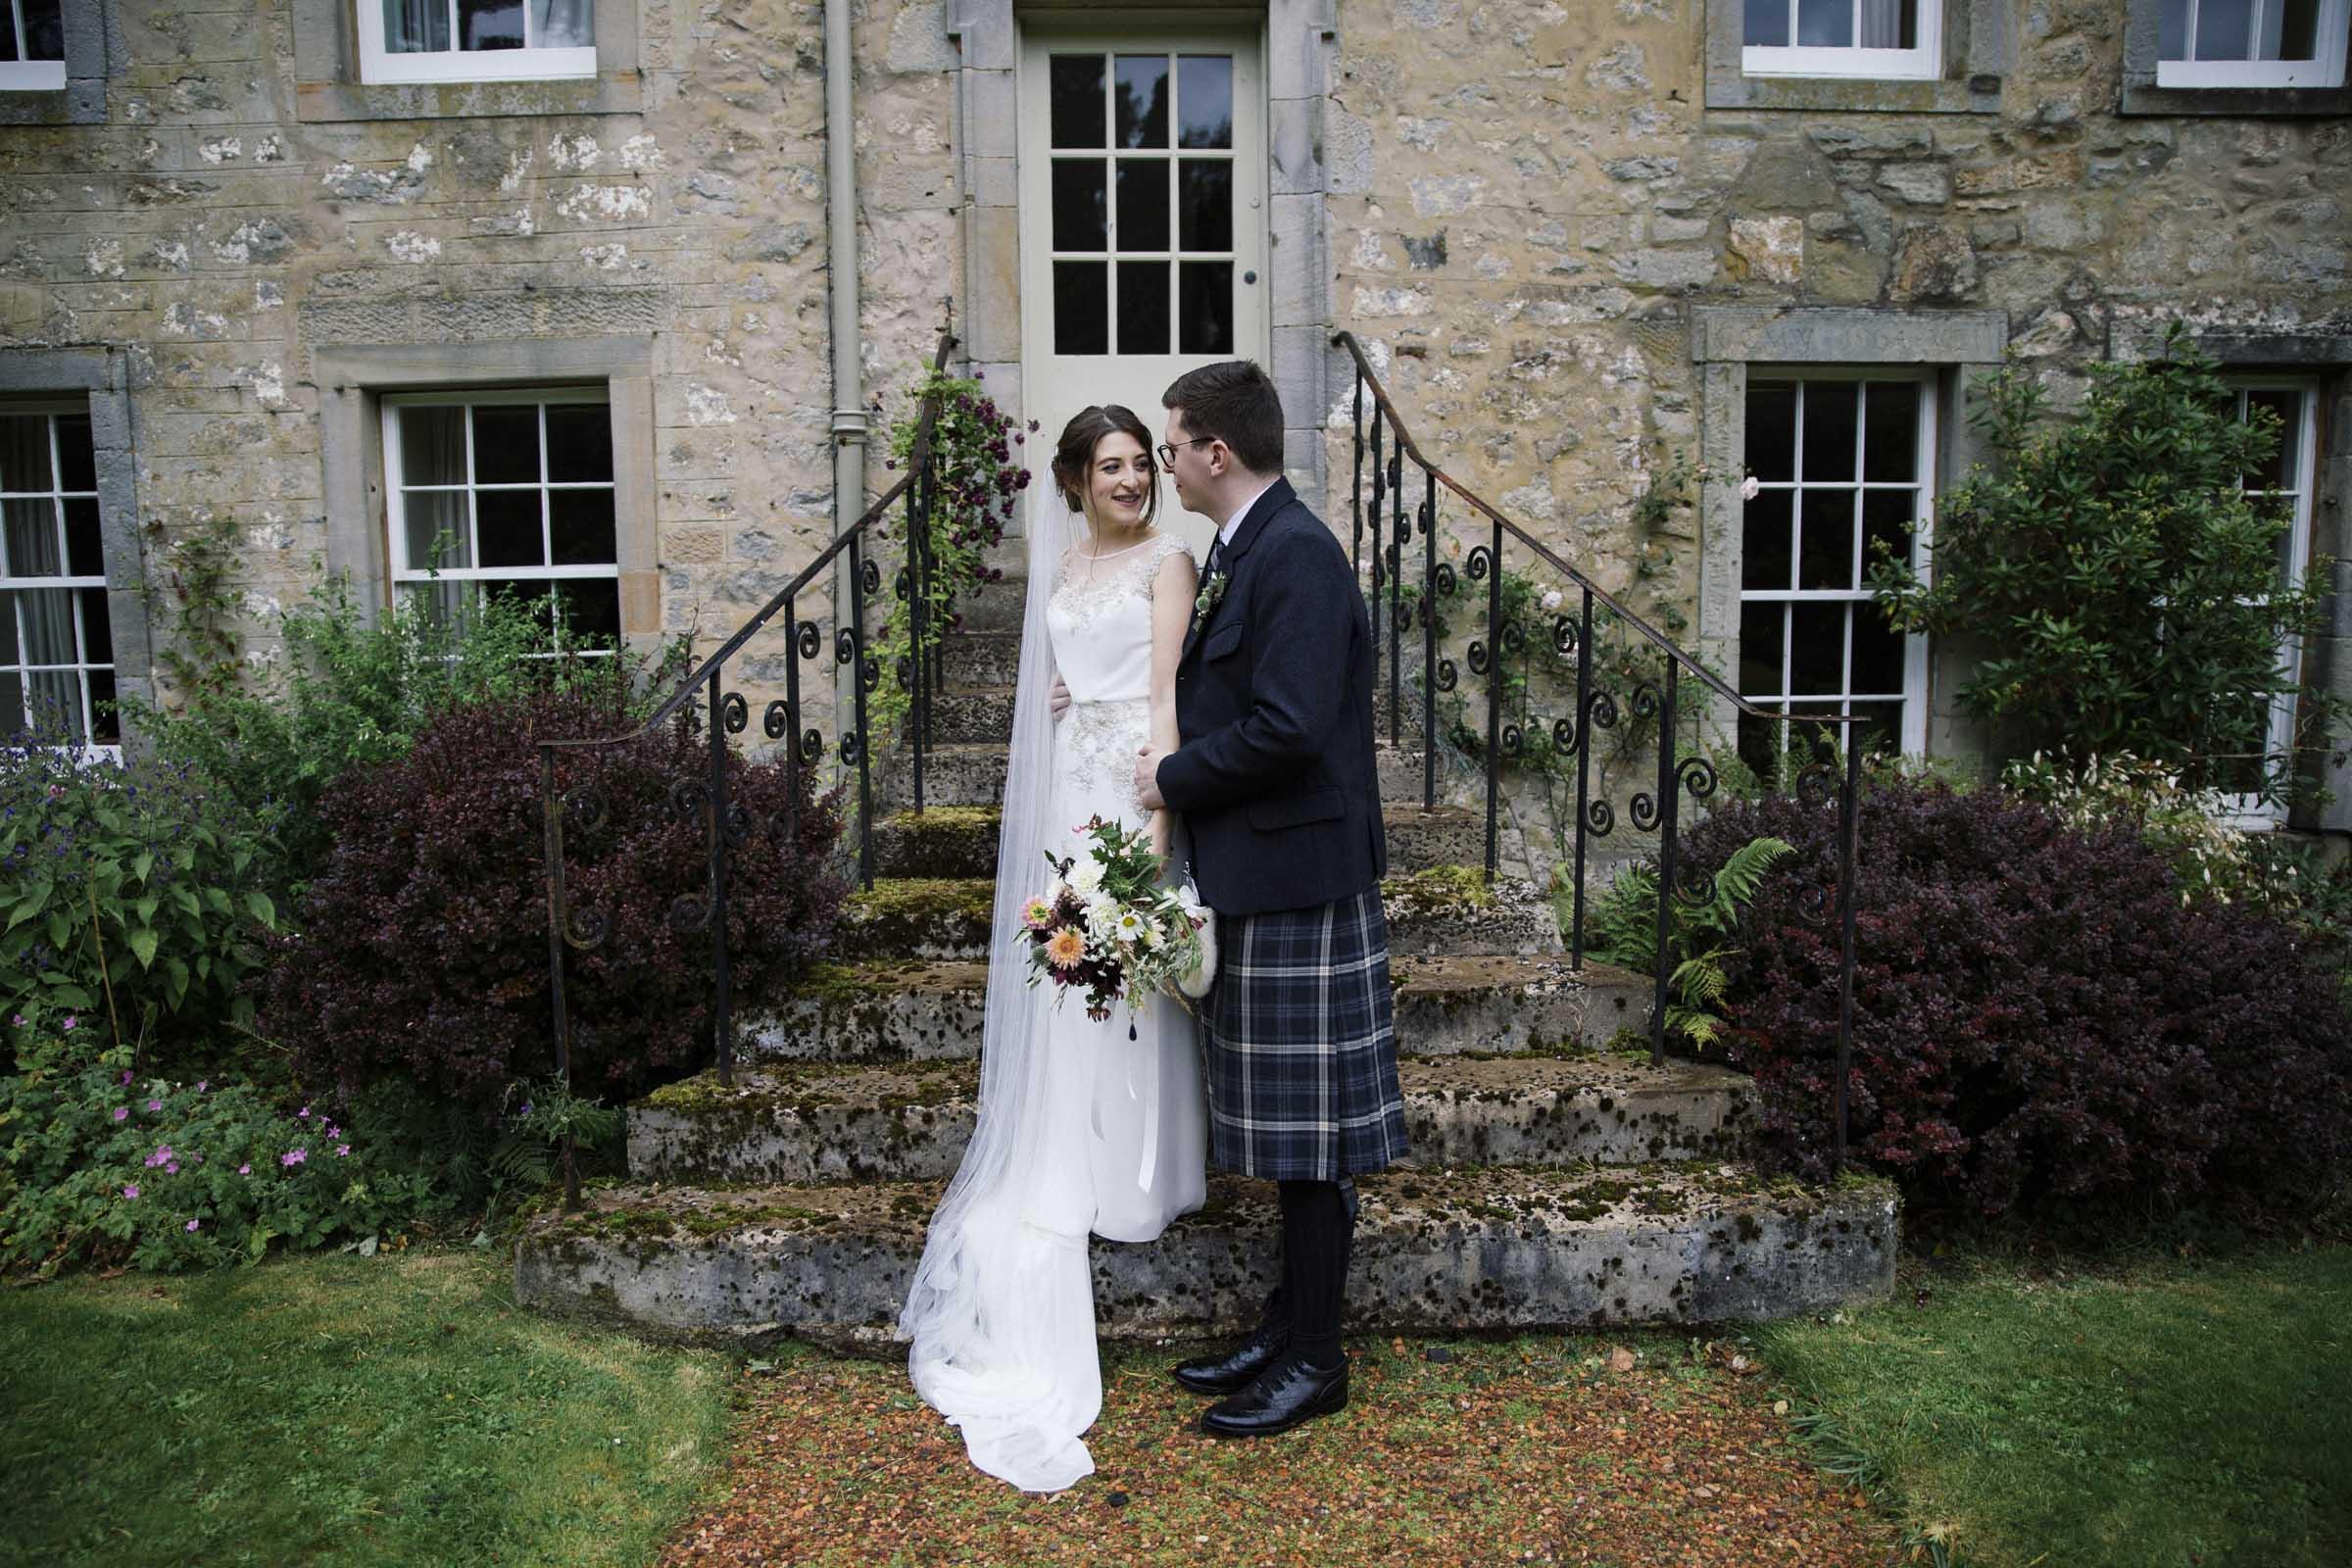 Scottish Wedding at Kirknewton Stables by Alternative Edinburgh Wedding Photographer - Ceranna Photography